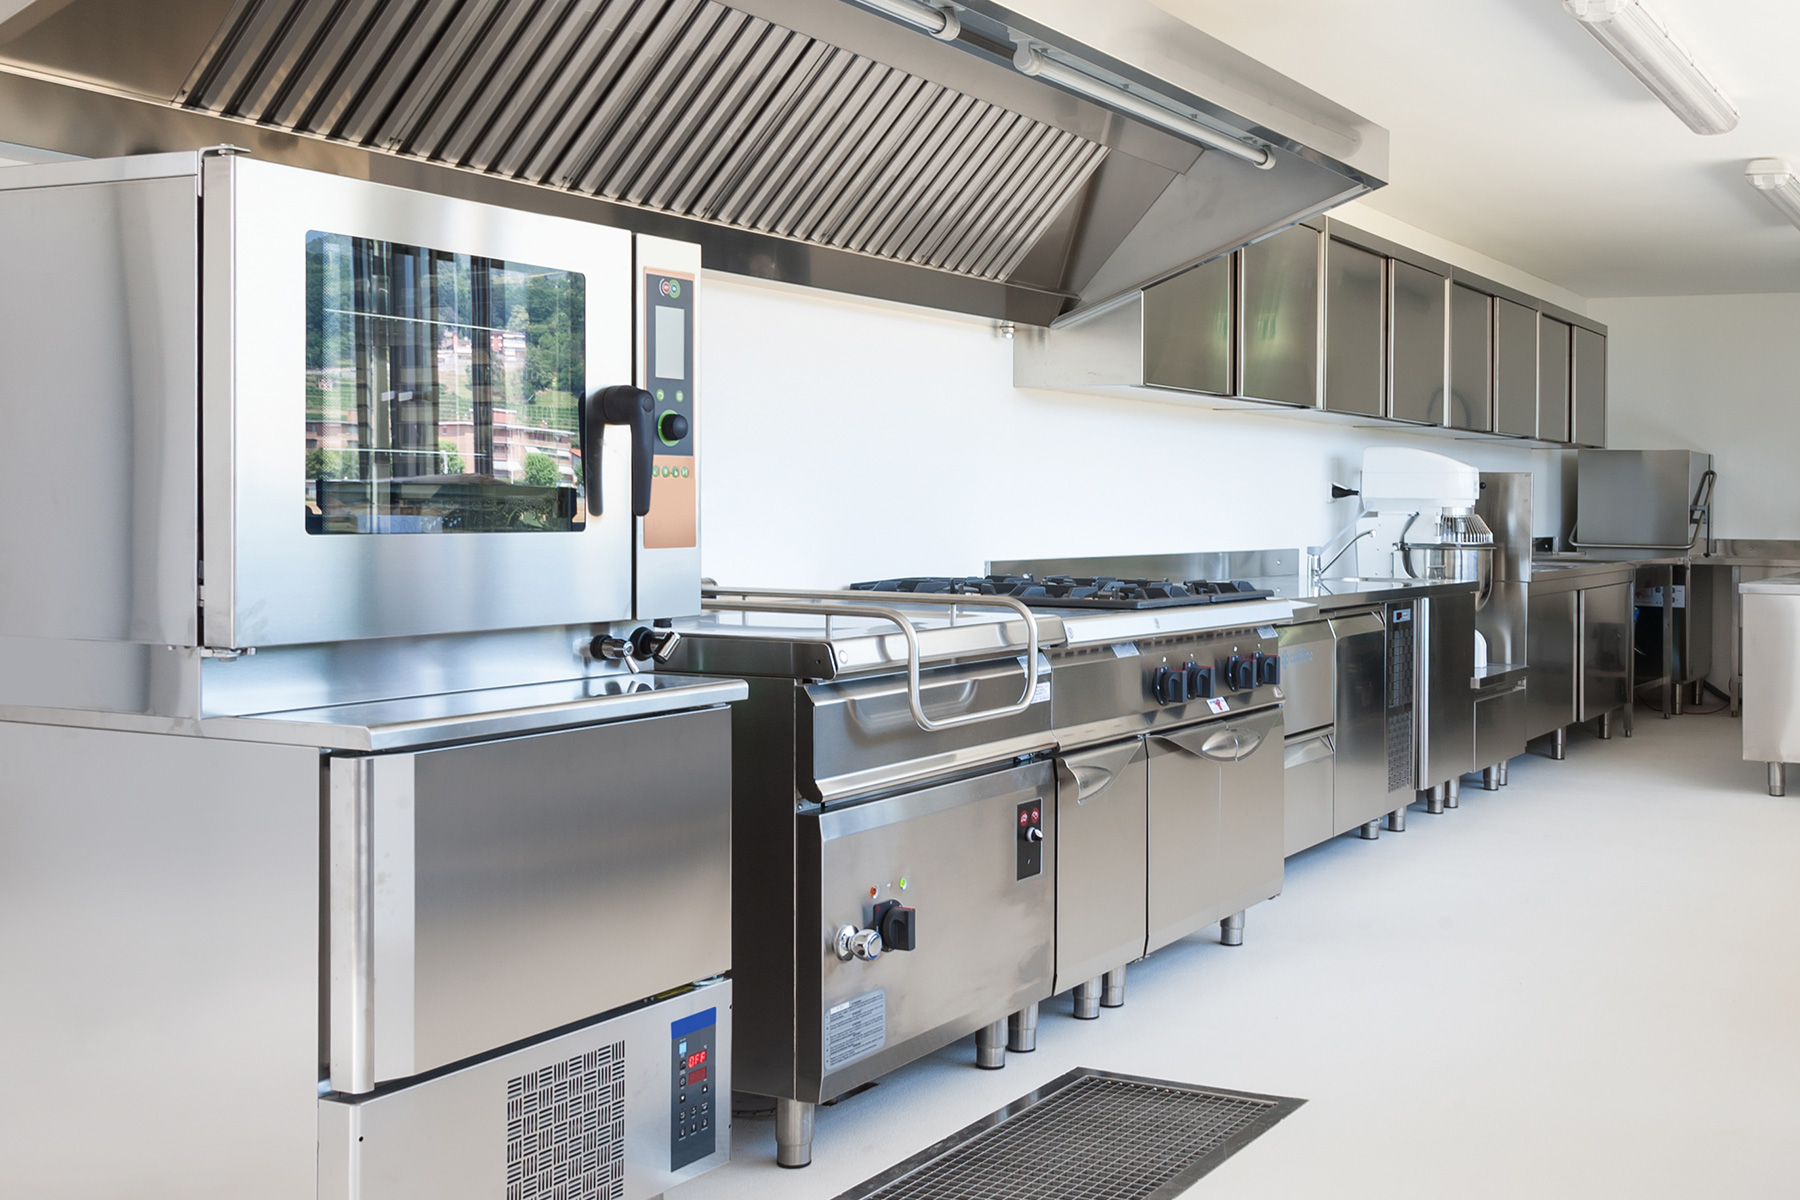 https://profichladenie.sk/wp-content/uploads/2021/09/SamTell-Blog-Restaurant-Kitchen-Design-Tips-to-Maximize-Functionality.jpg